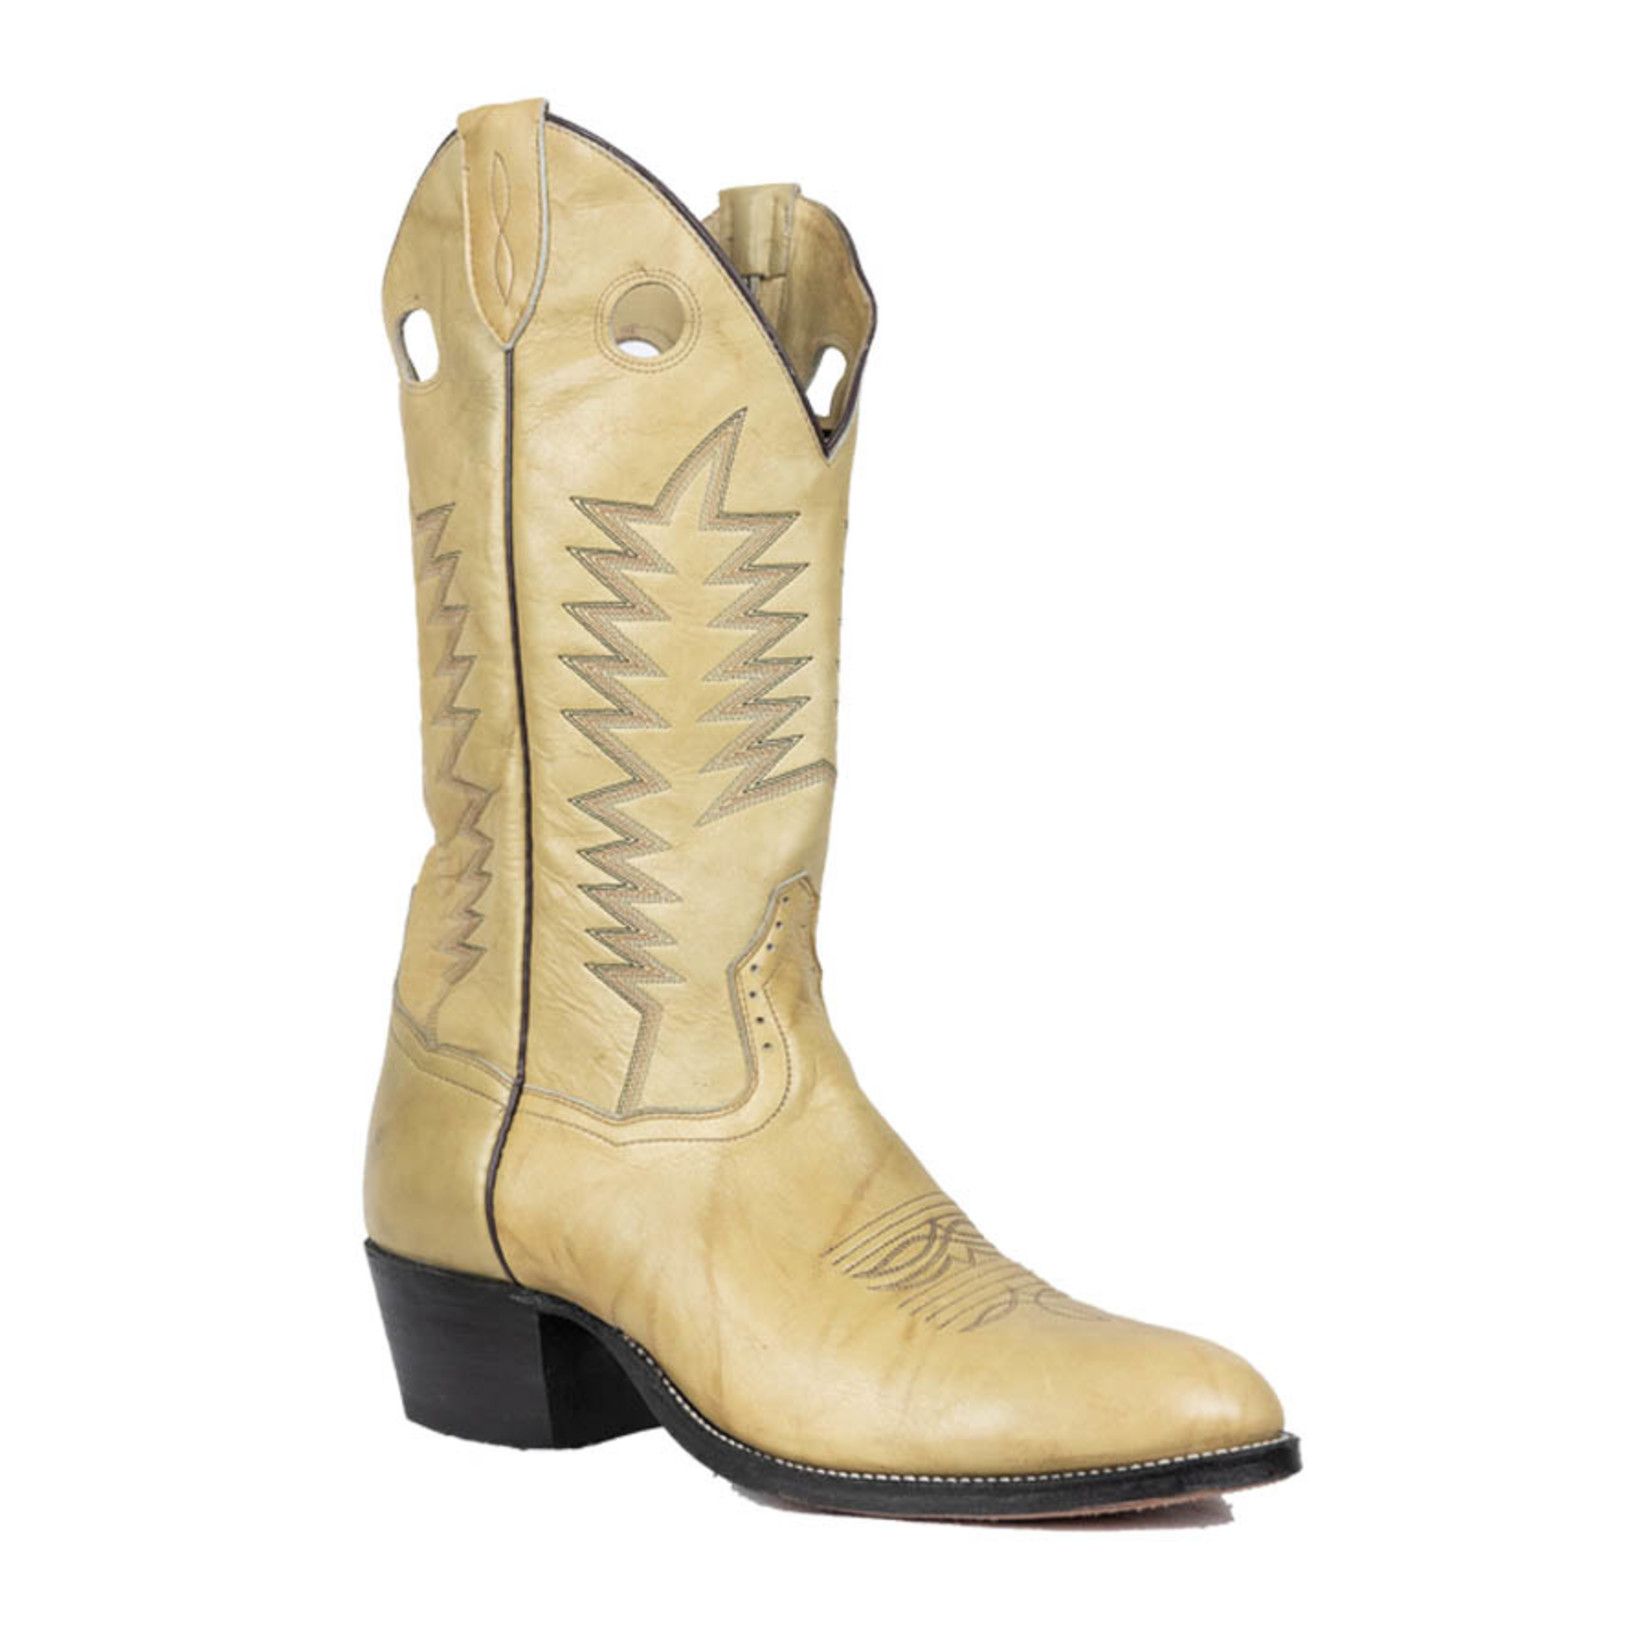 Brahma Brahma Men's Cowboy Boot 8092 E